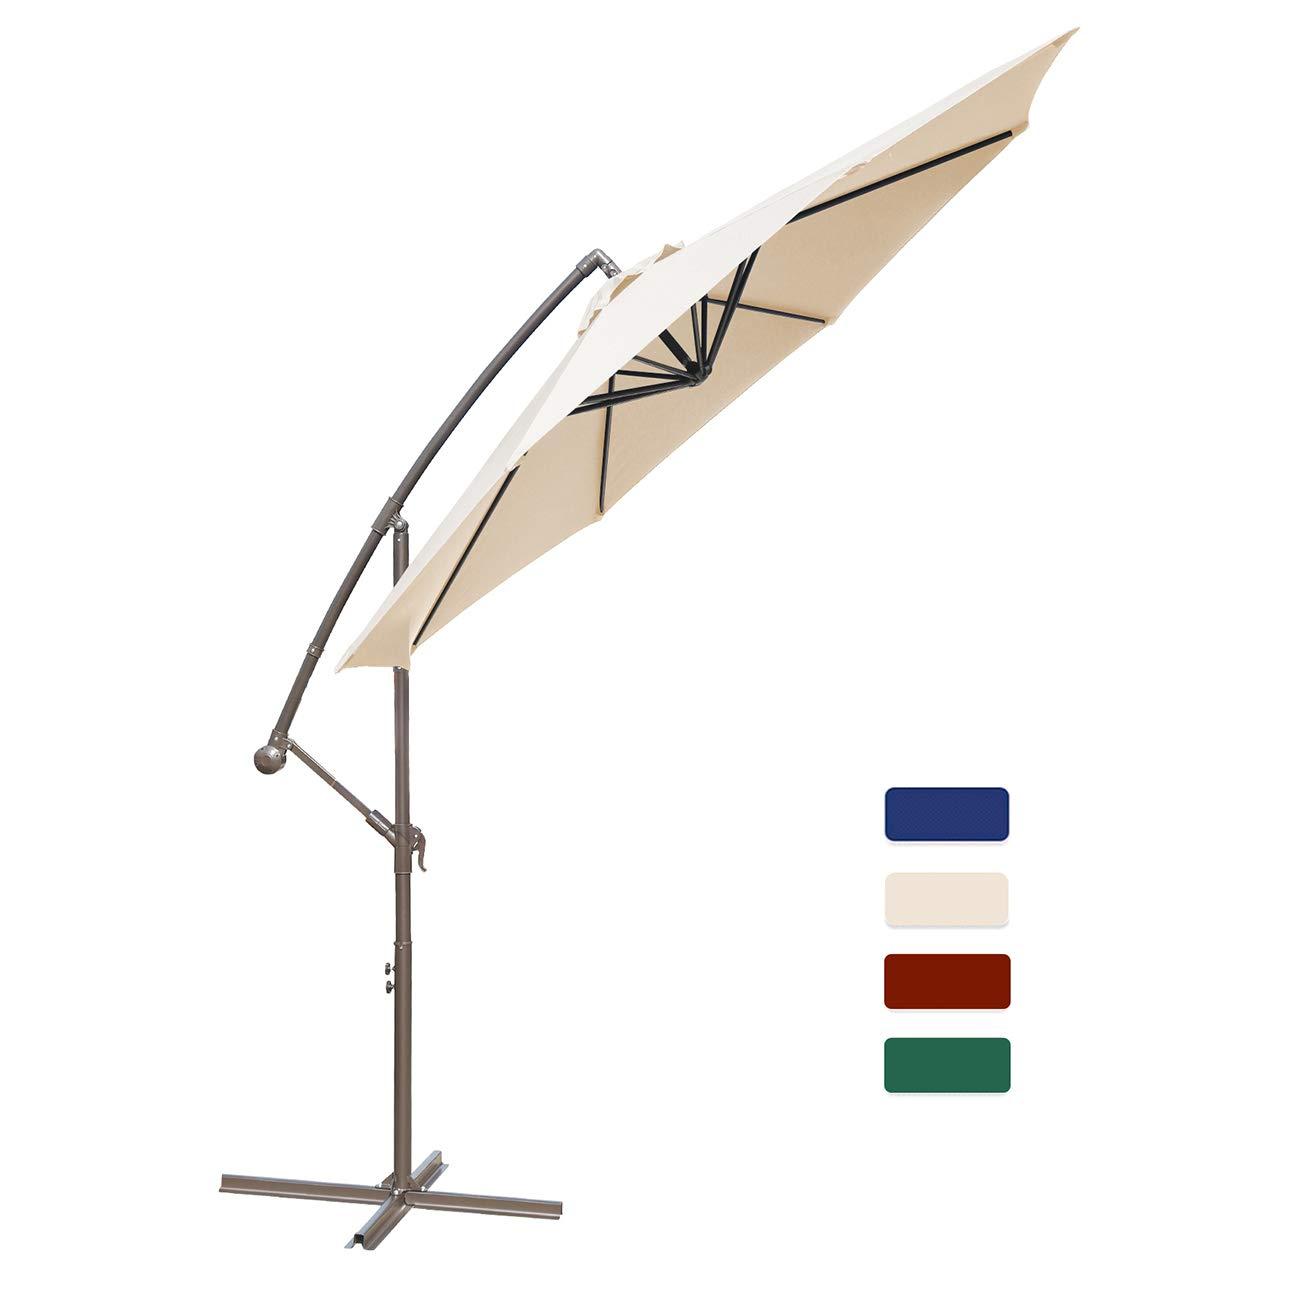 HASLE OUTFITTERS Offset Patio Umbrella 10FT Cantilever Umbrella Outdoor Market Umbrella Hanging Umbrella with Cross Base Beige